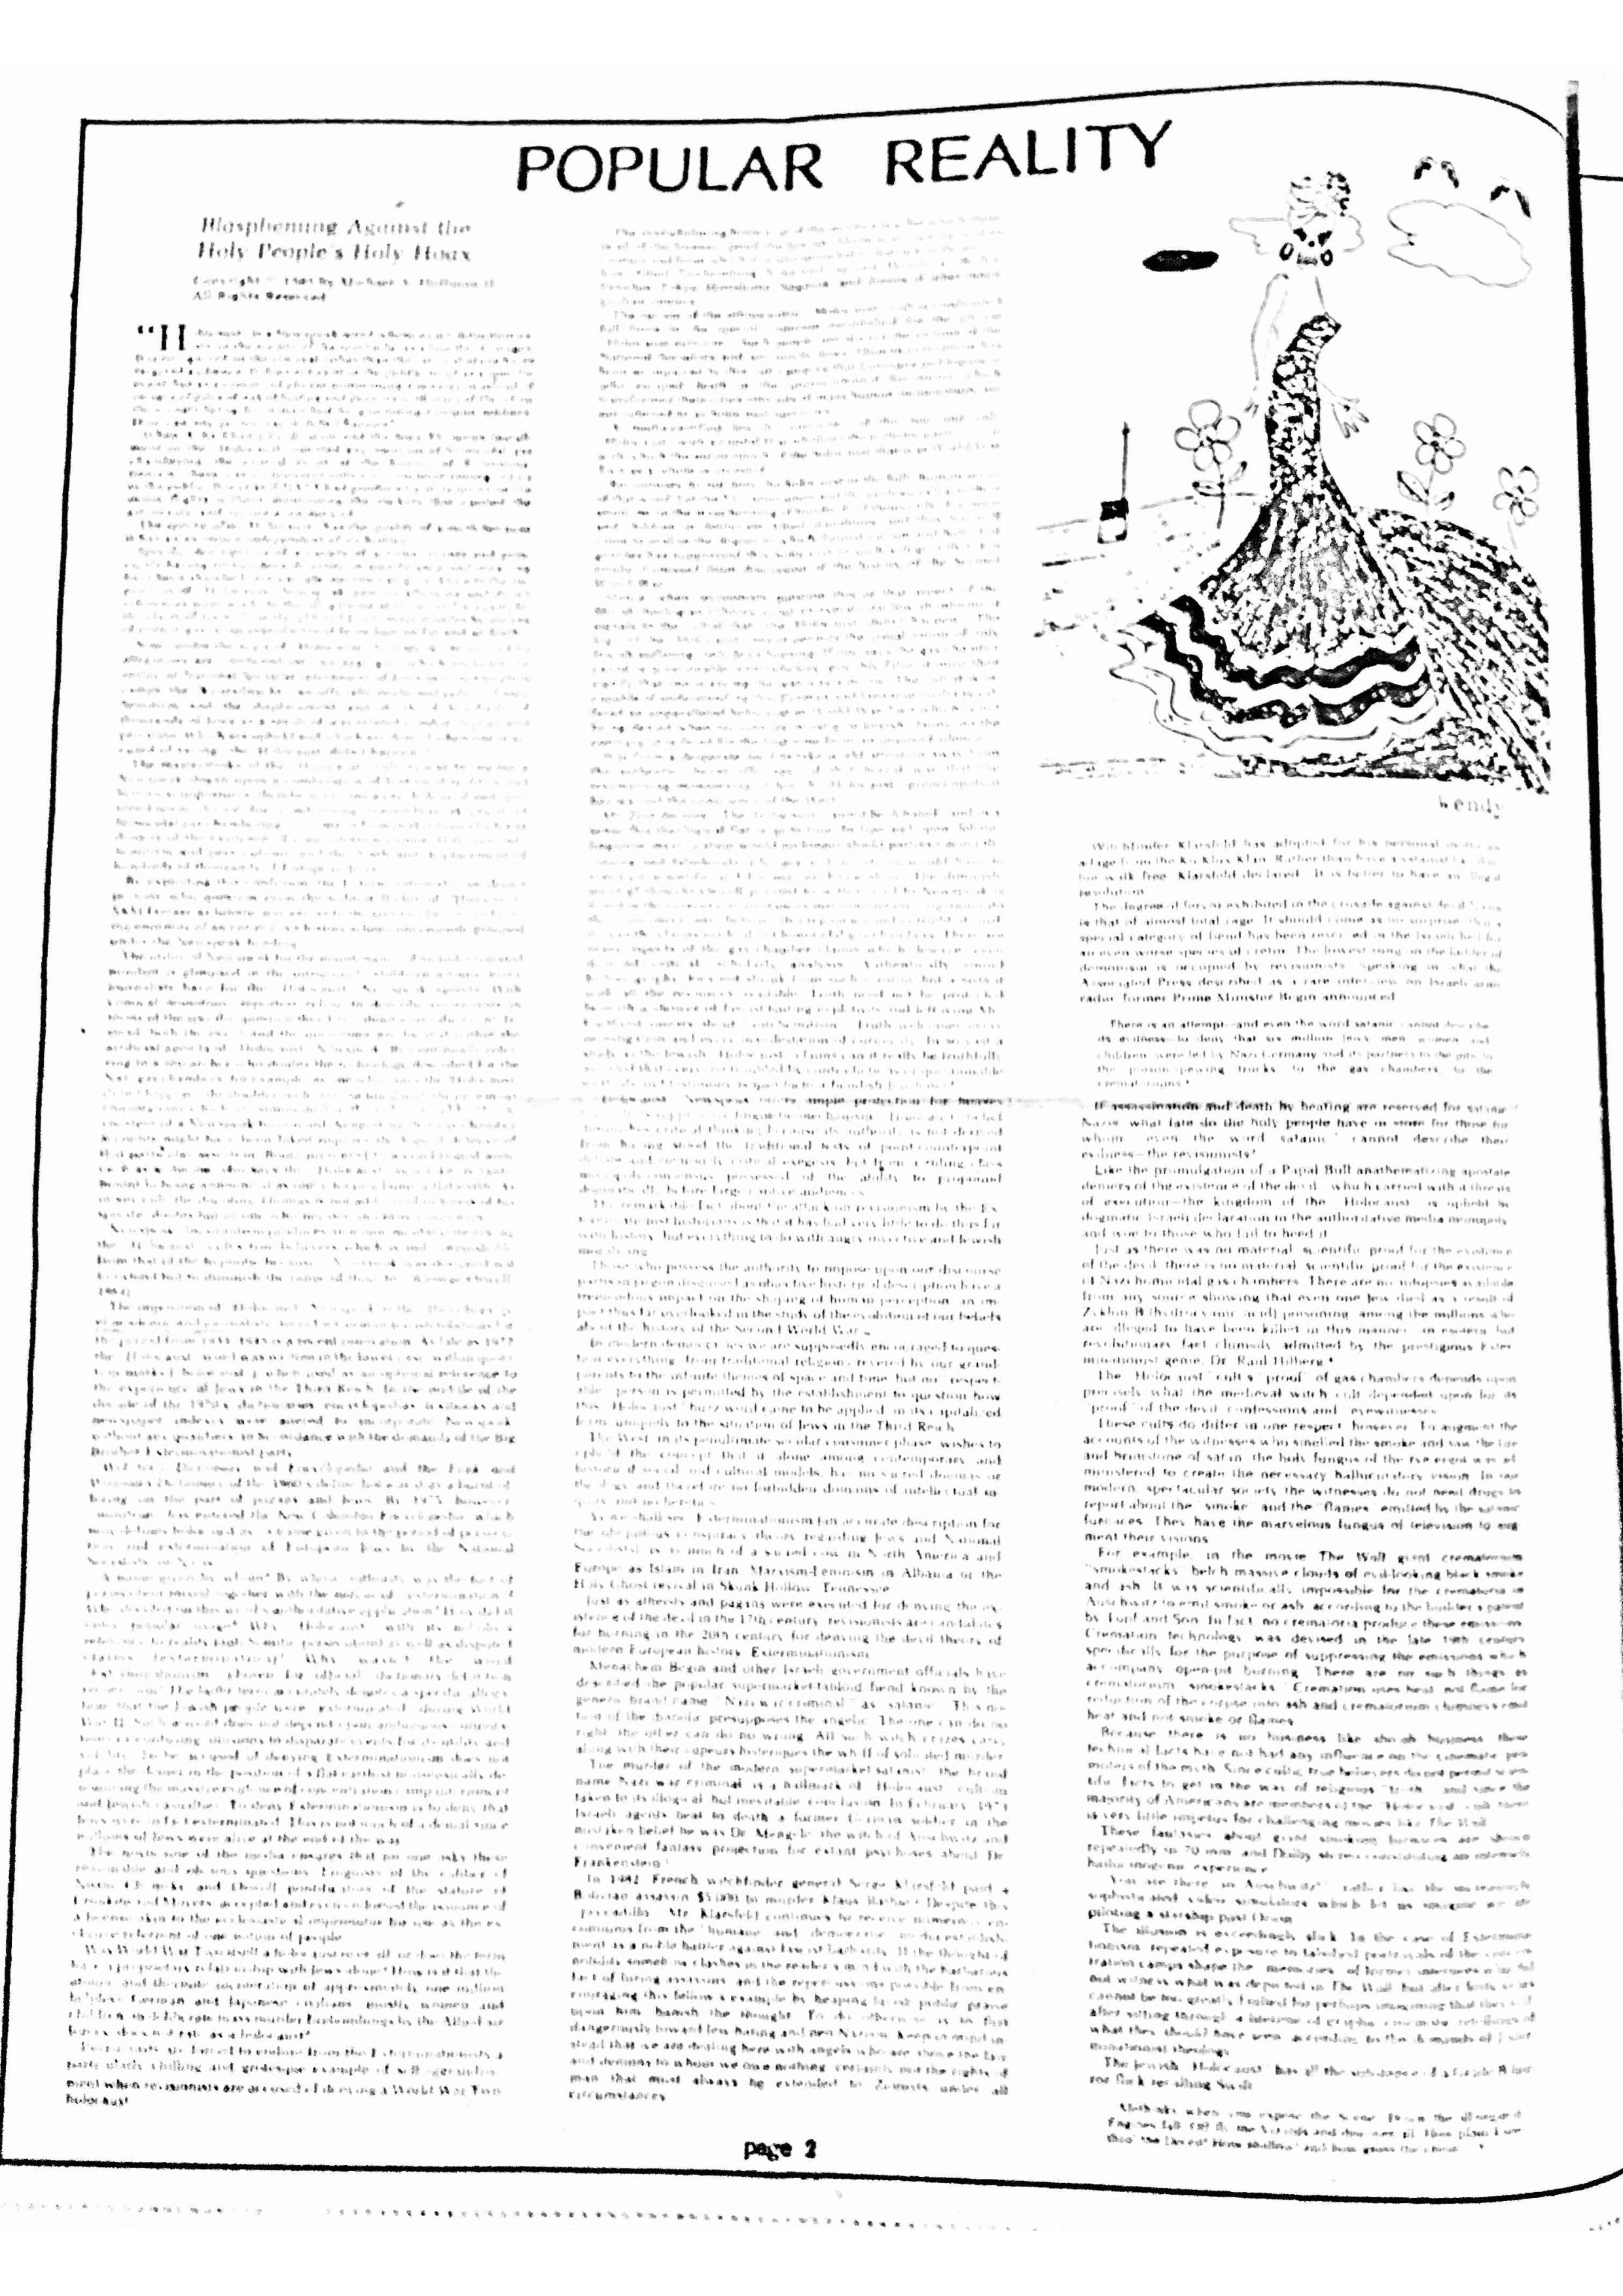 PopRealNo17-page-002.jpg